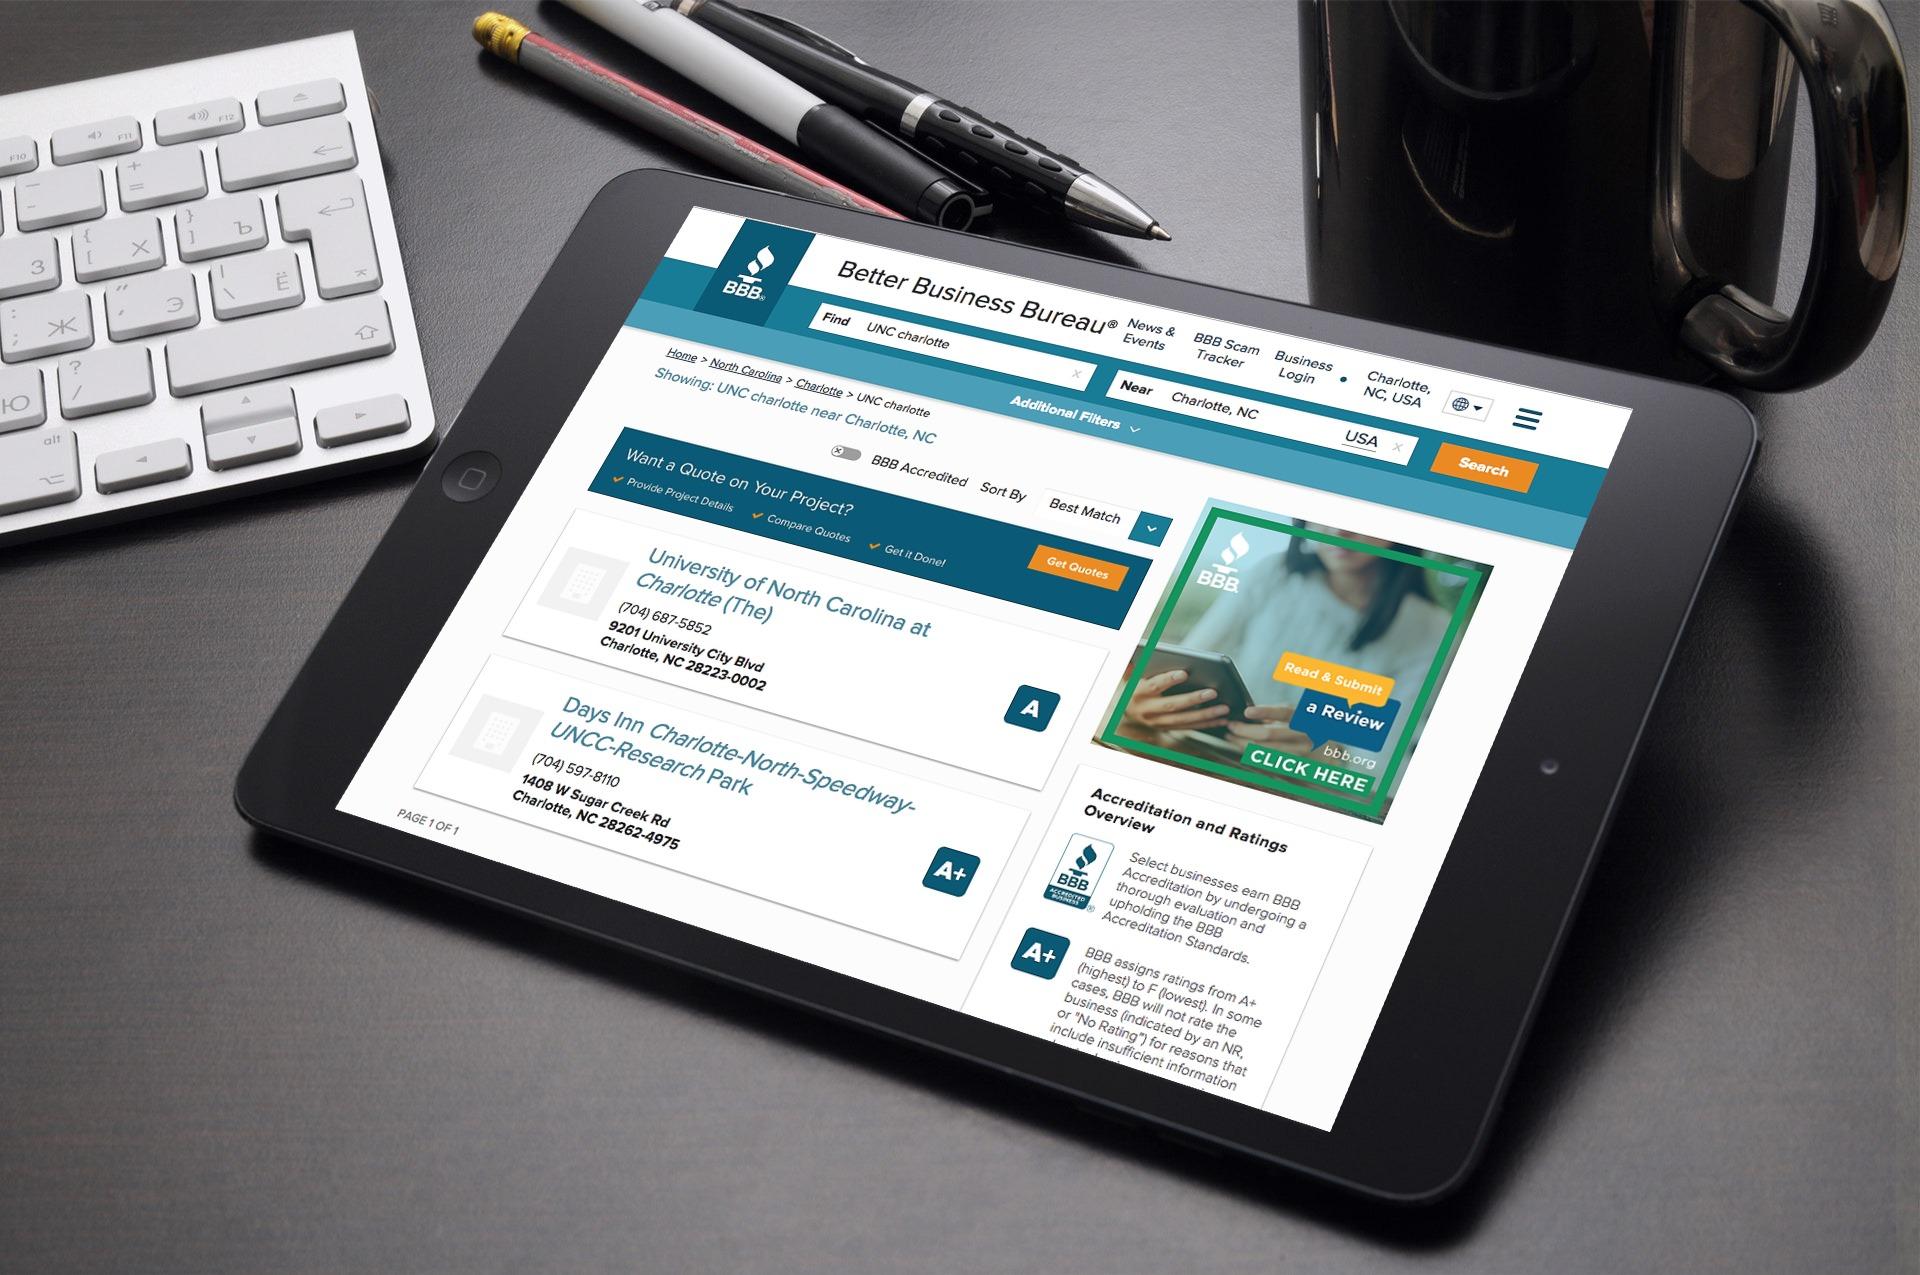 BBB tablet smartmockups_jkpxfi60